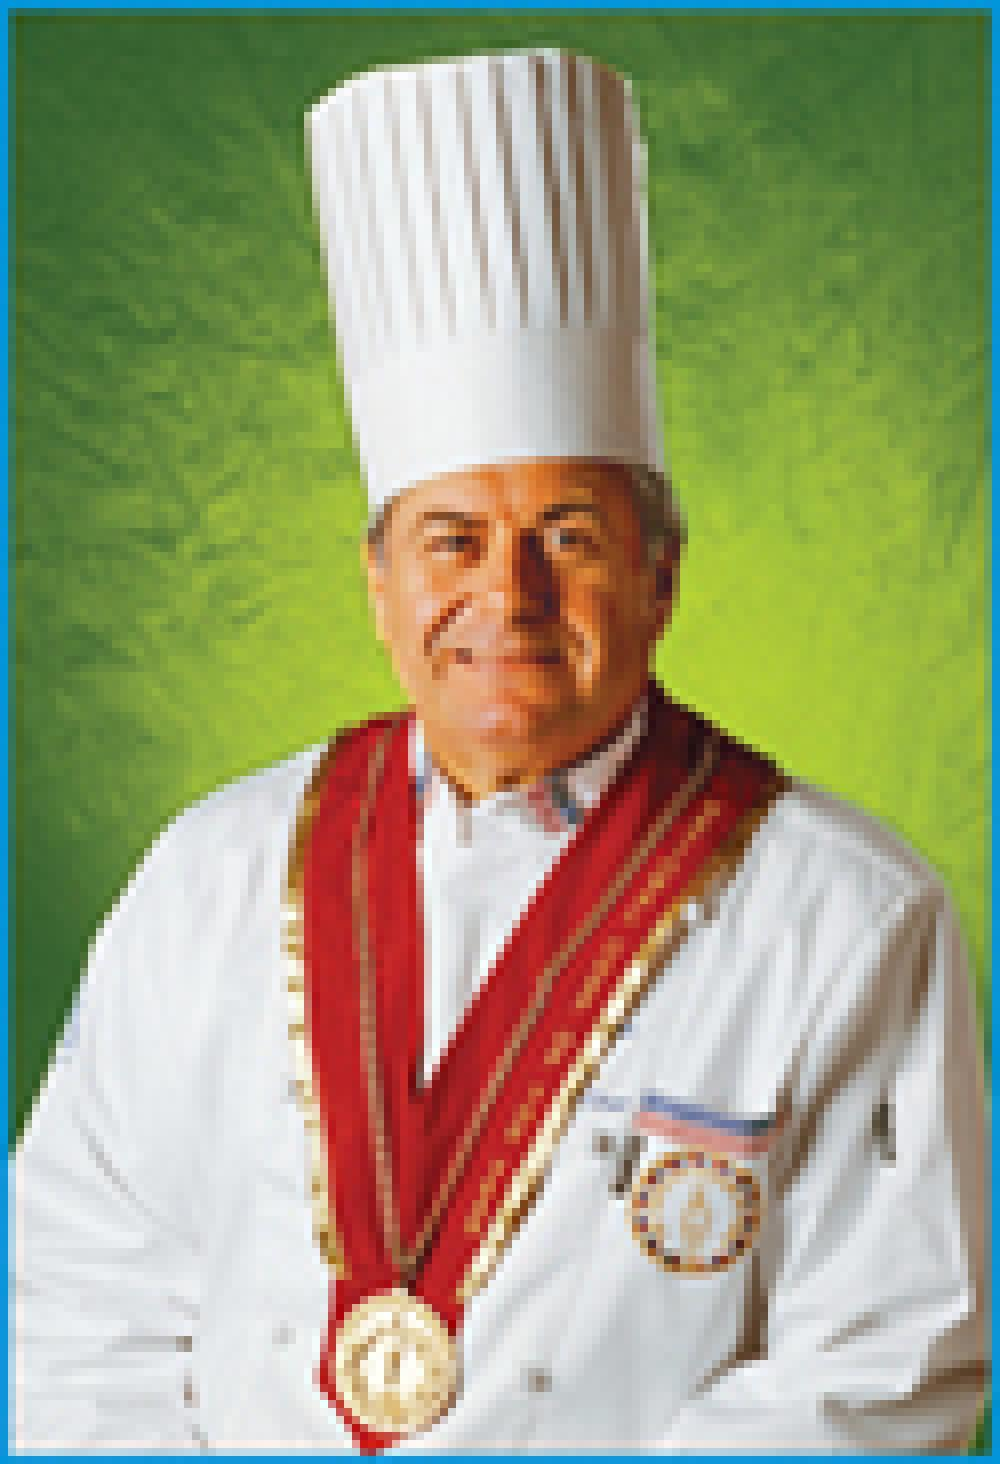 HALL OF FAME: Bert P. Cutino